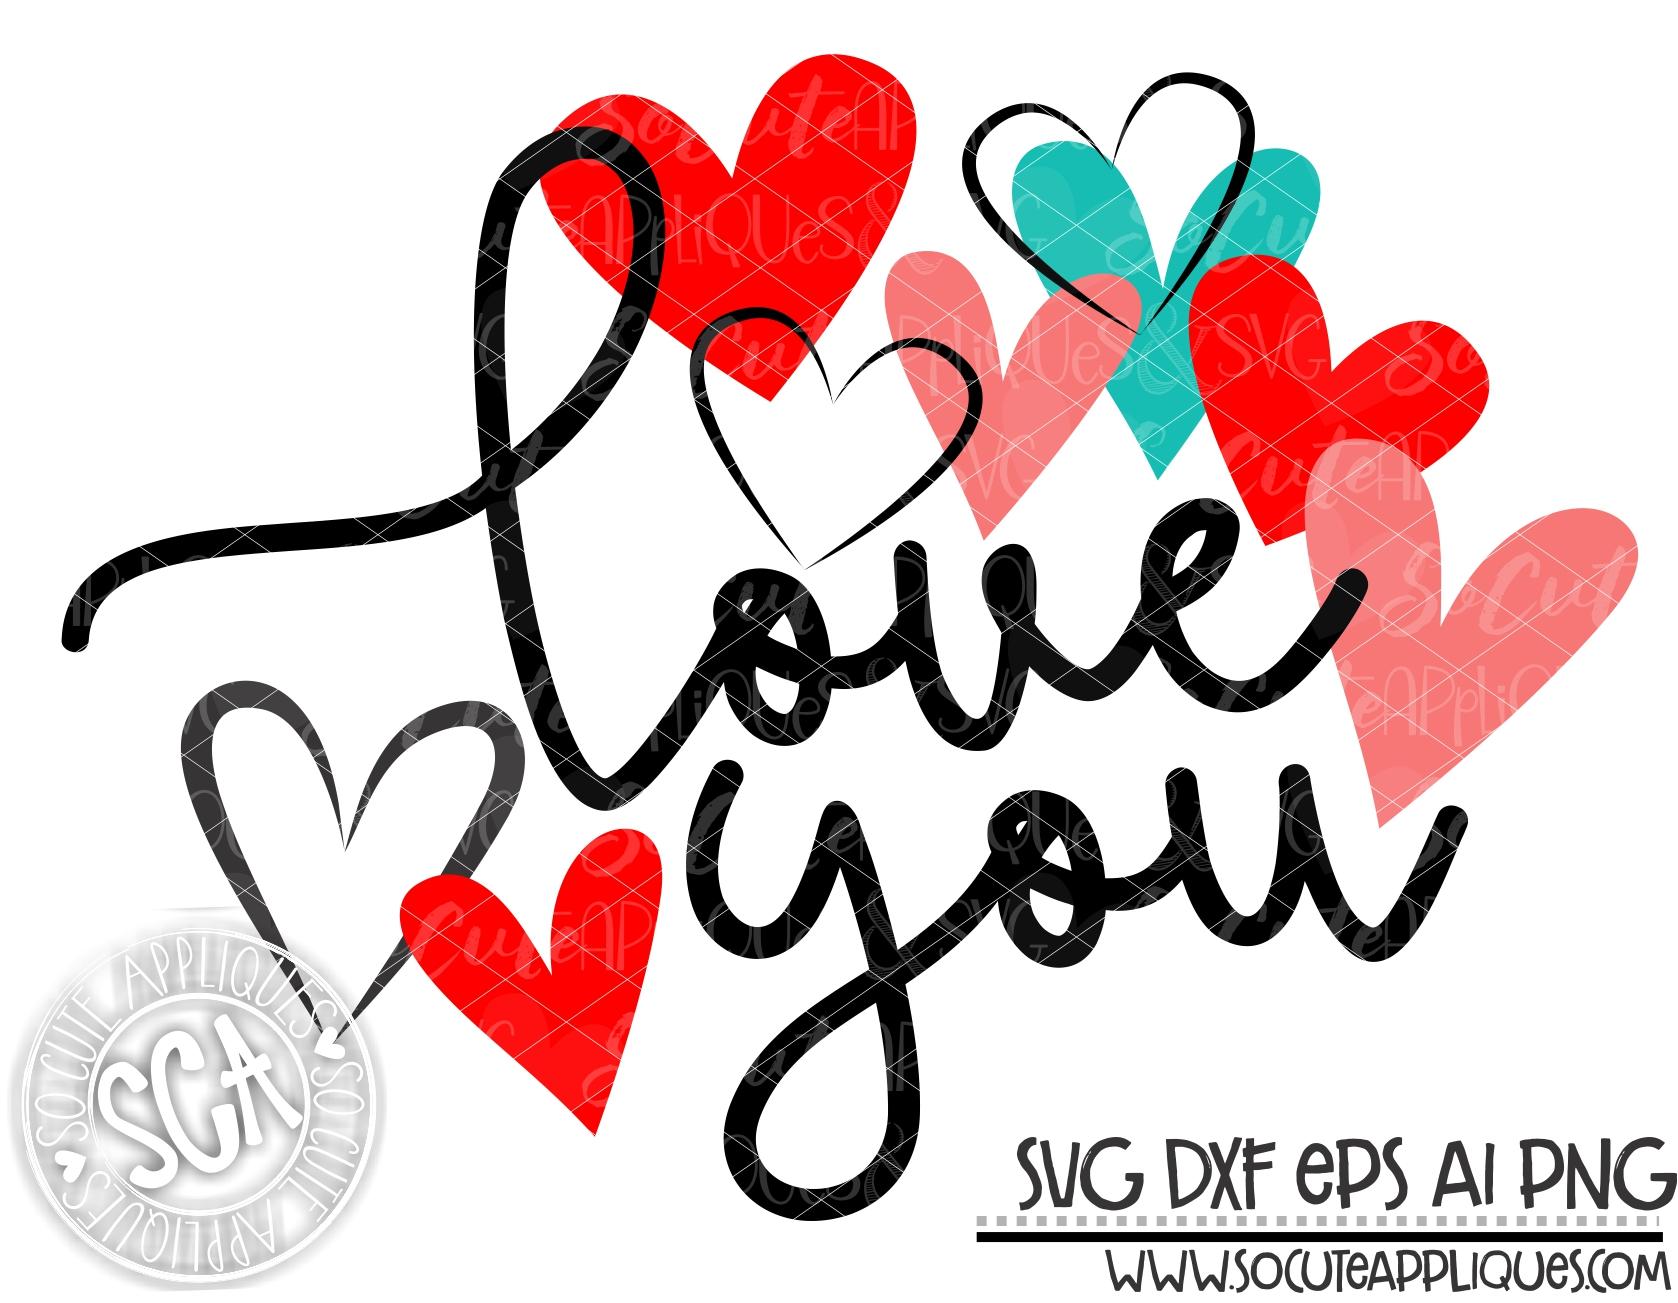 Download love you multi heart 18 svg sca - socuteappliques.net